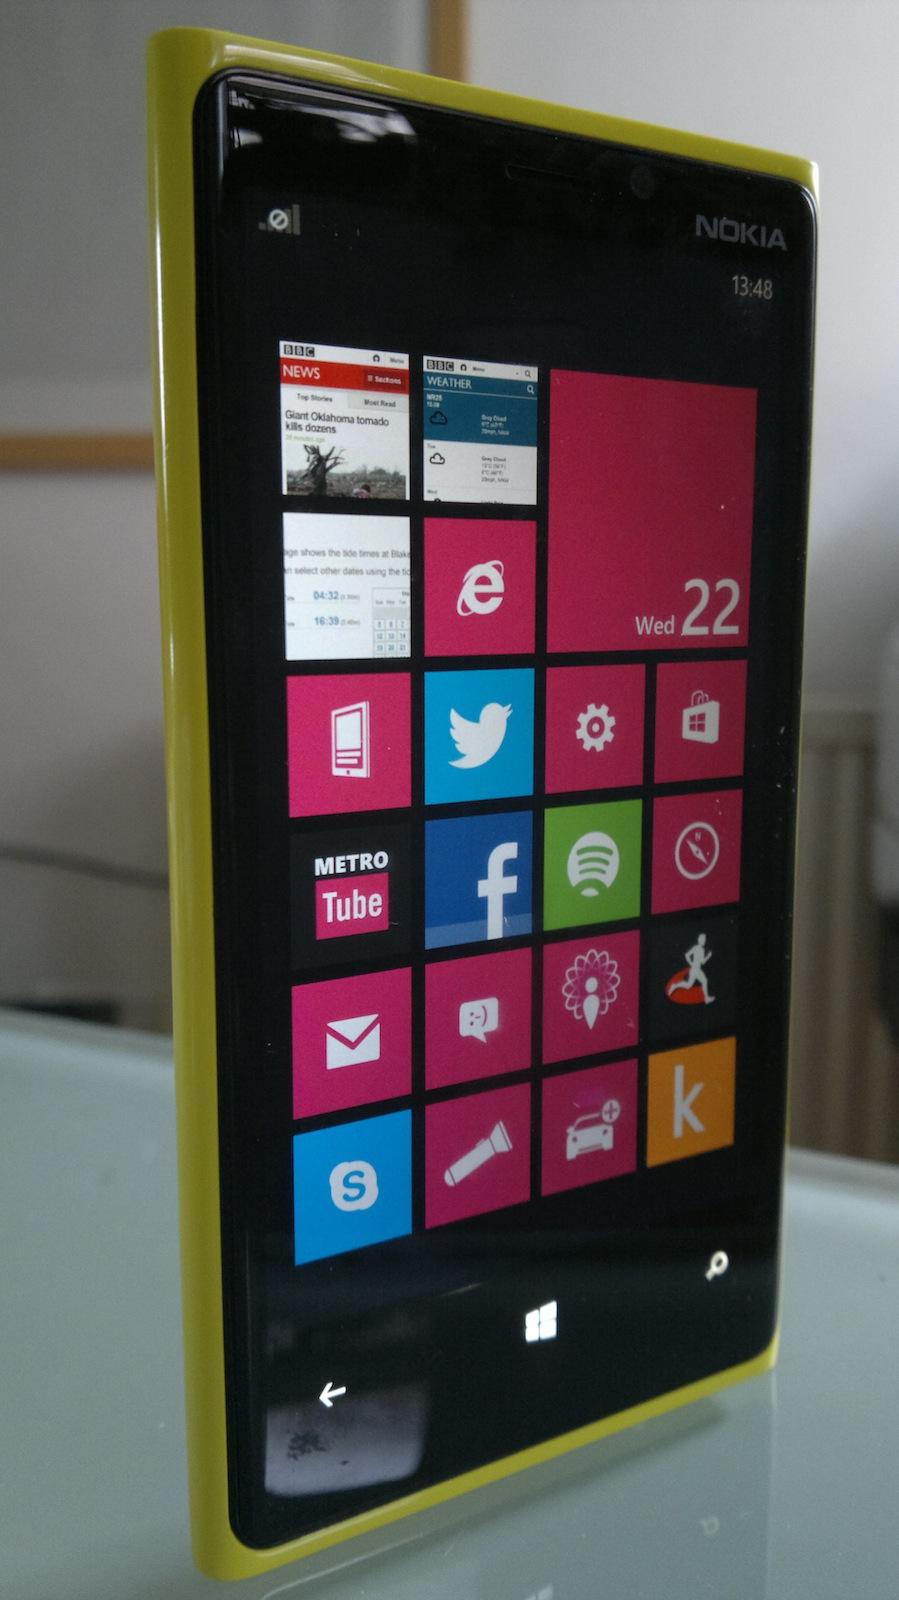 Nokia Lumia 920 standing upright